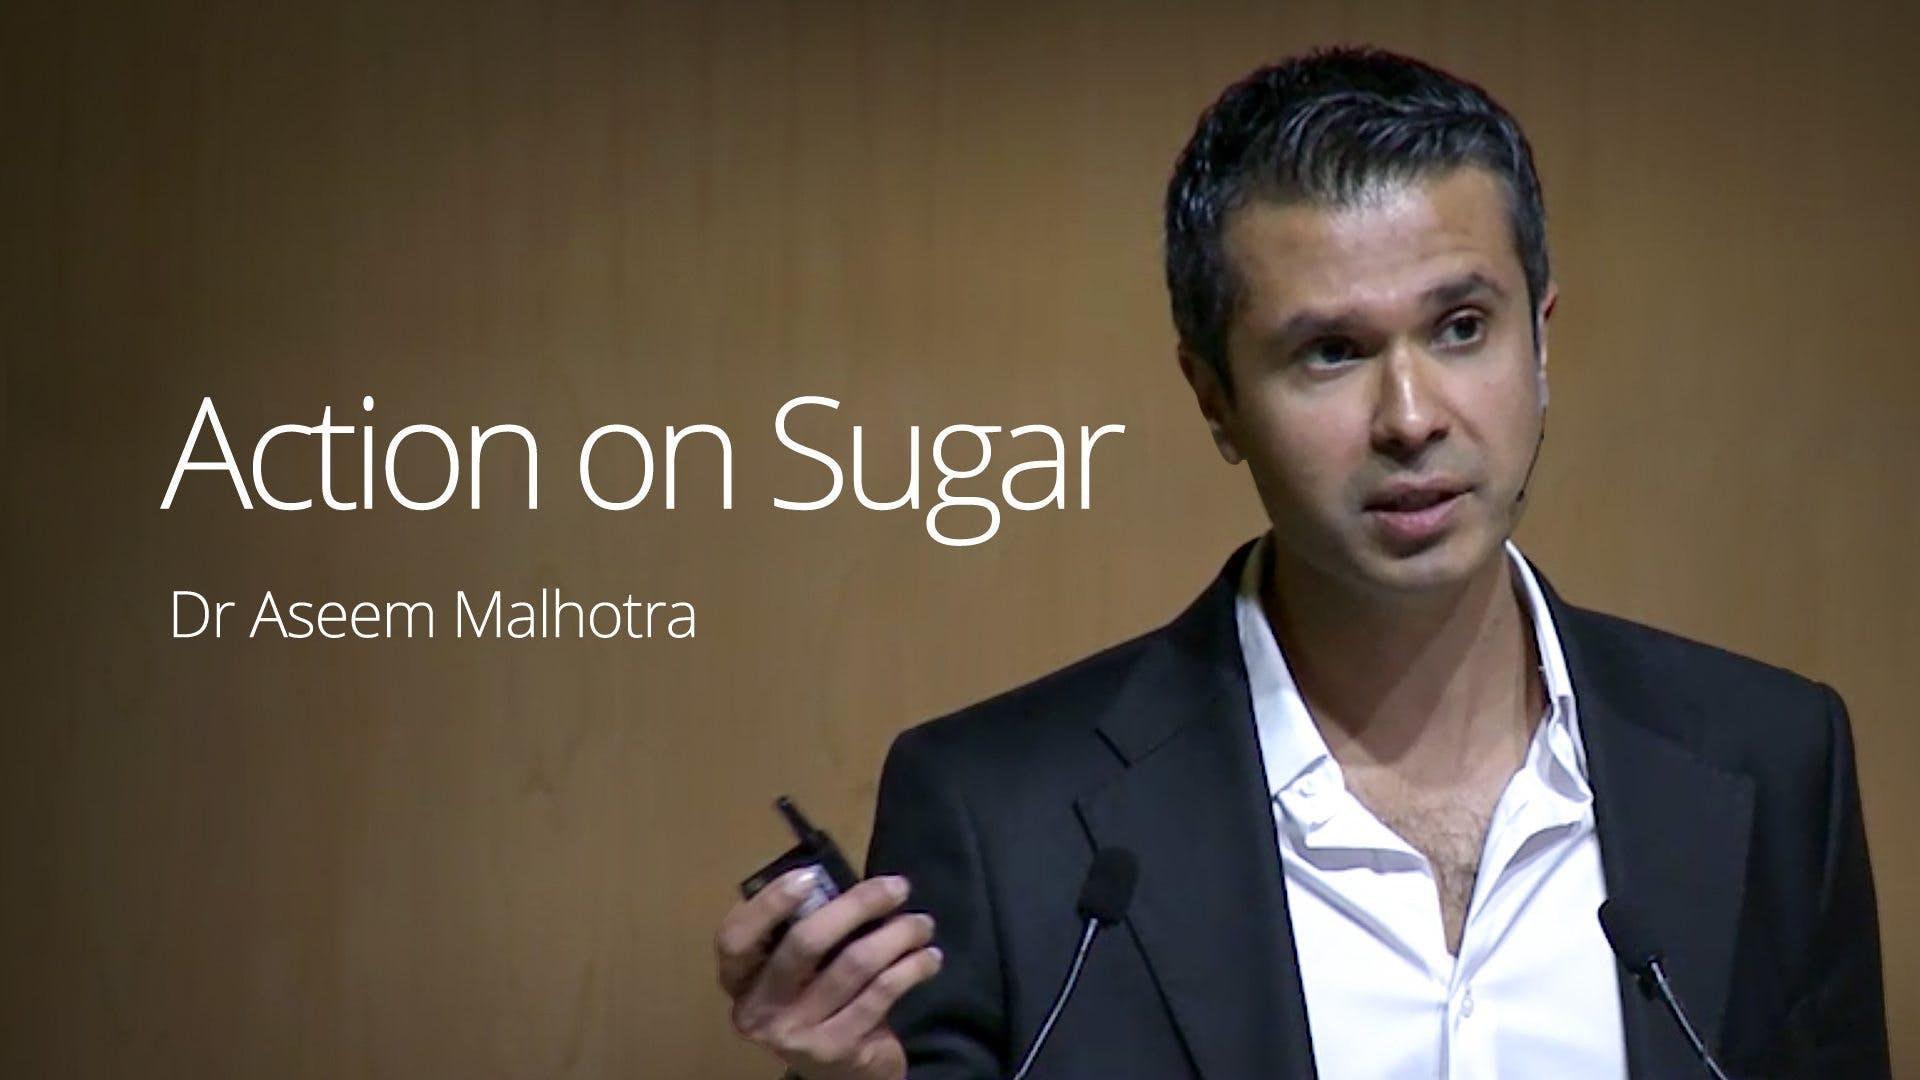 Action on sugar